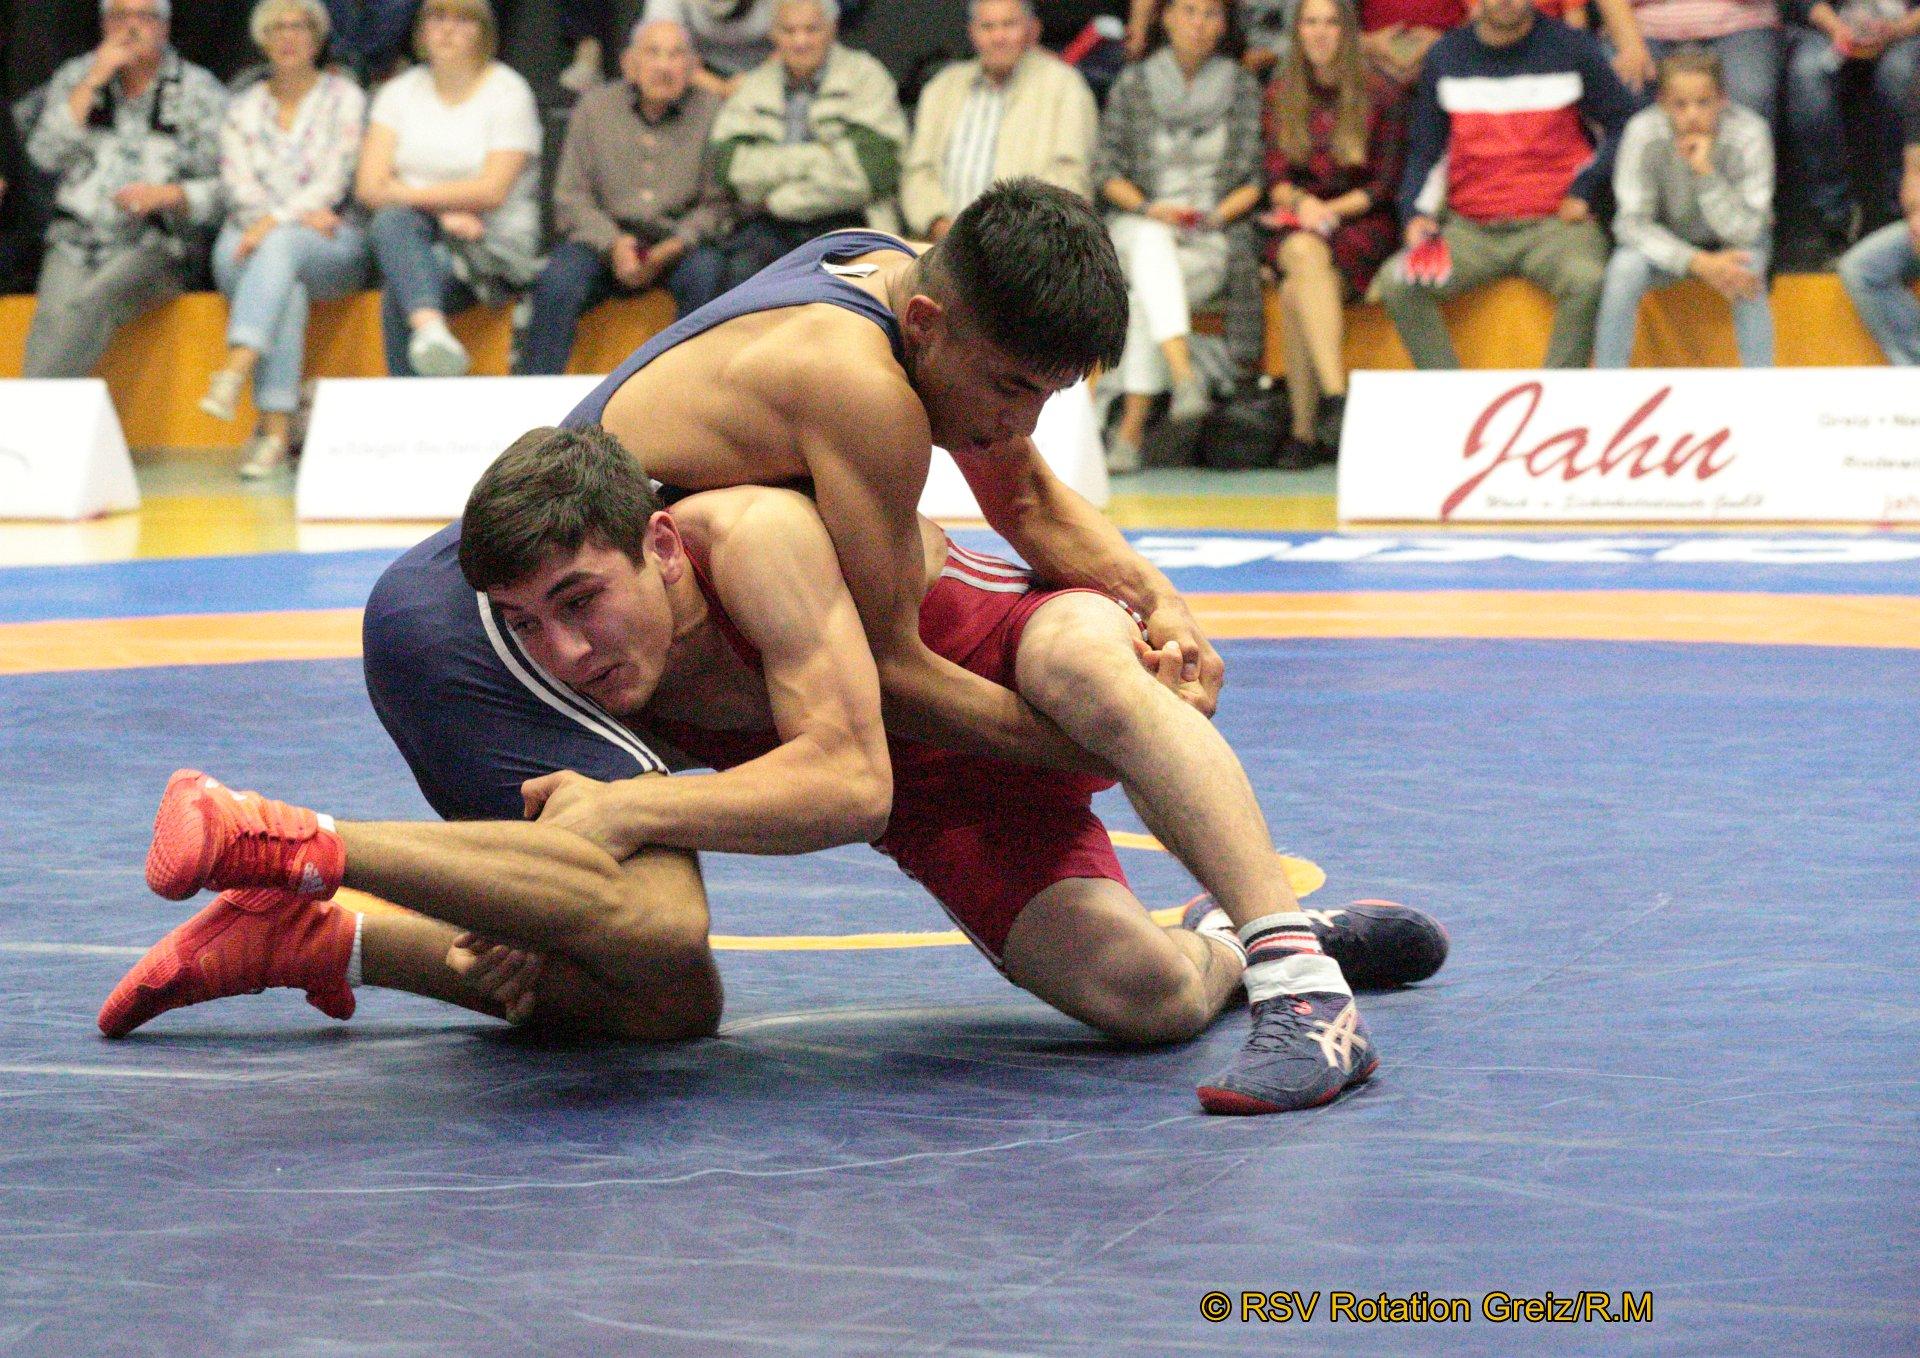 61kg Freistil Rasul Galamatov (rotes Trikot), RSV Rotation Greiz II gegen Adel Gul Hussain, FC Erzgebirge Aue II 3:0/PS/15:4/06:00